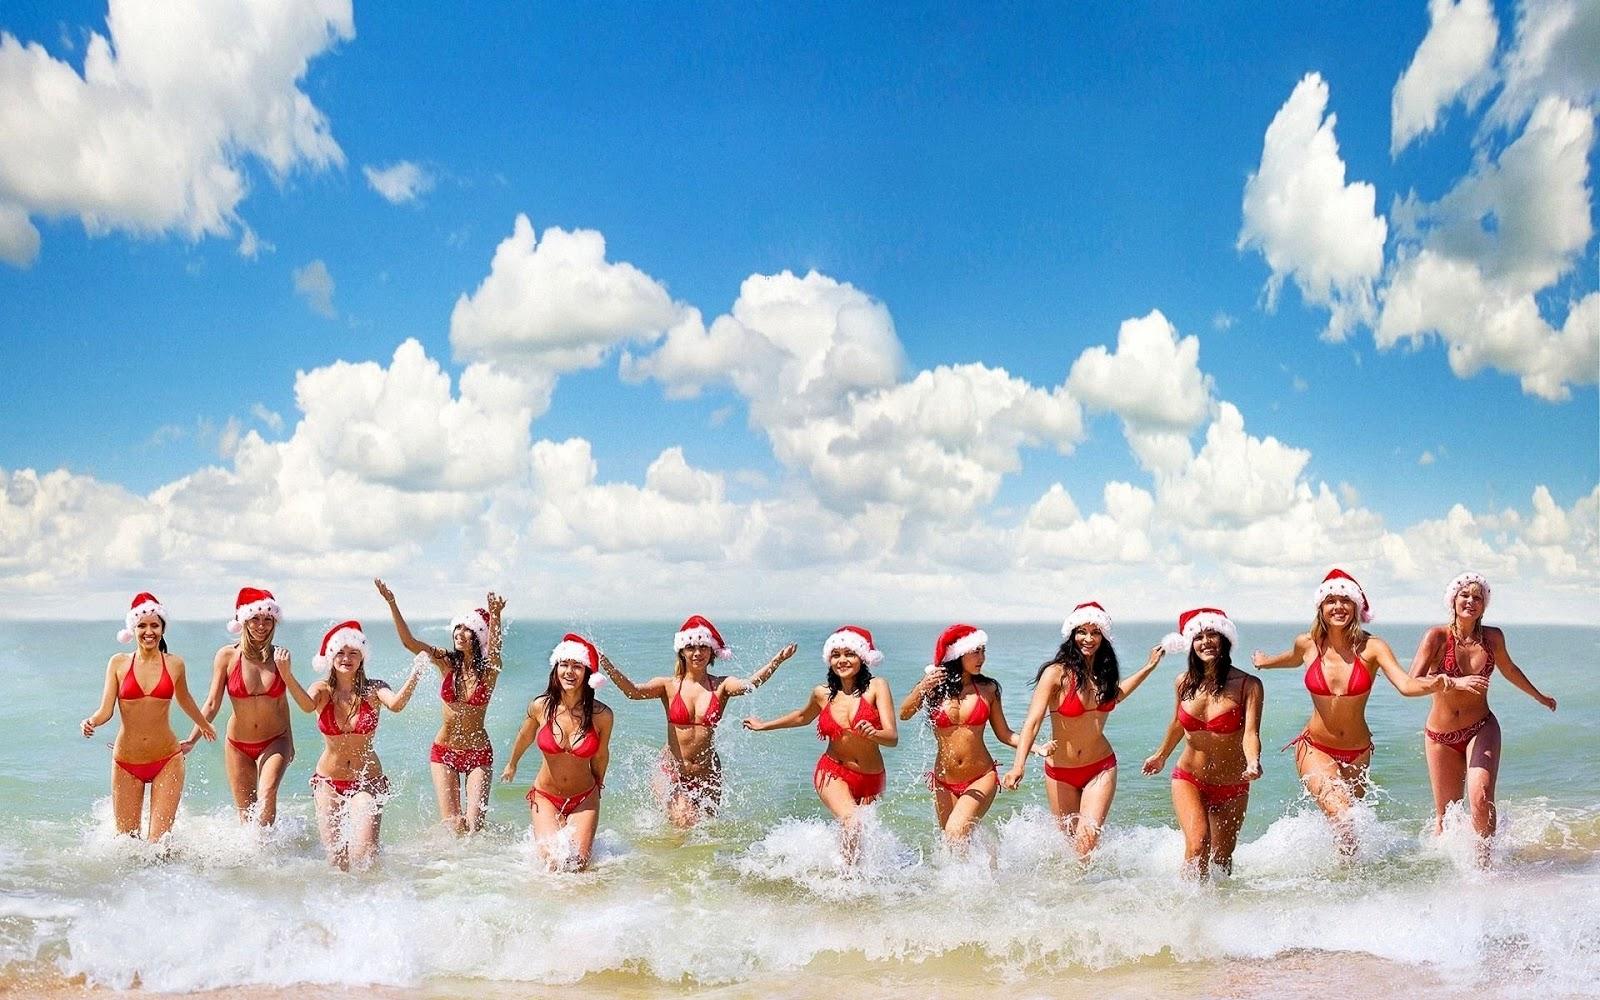 summer-santa-claus-9